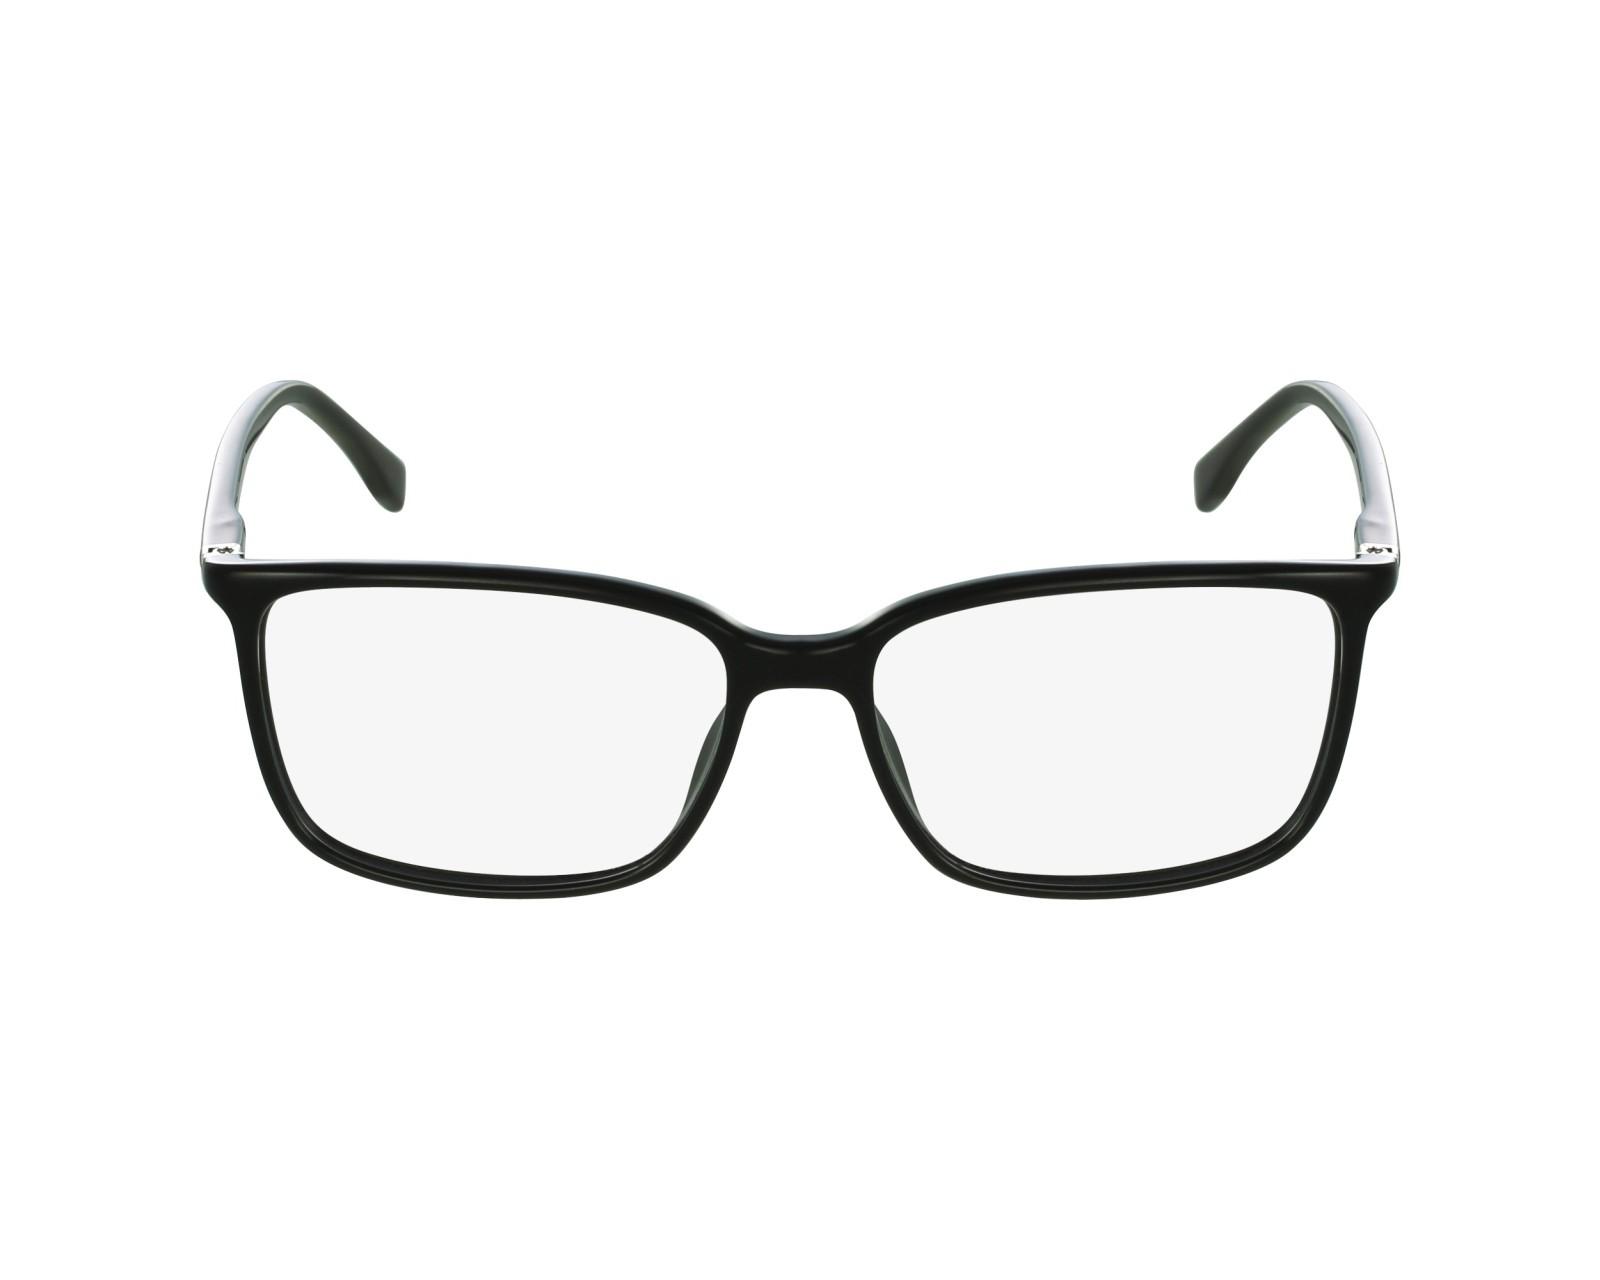 15ddd229c50 eyeglasses Hugo Boss BOSS-0679 807 56-15 Black profile view